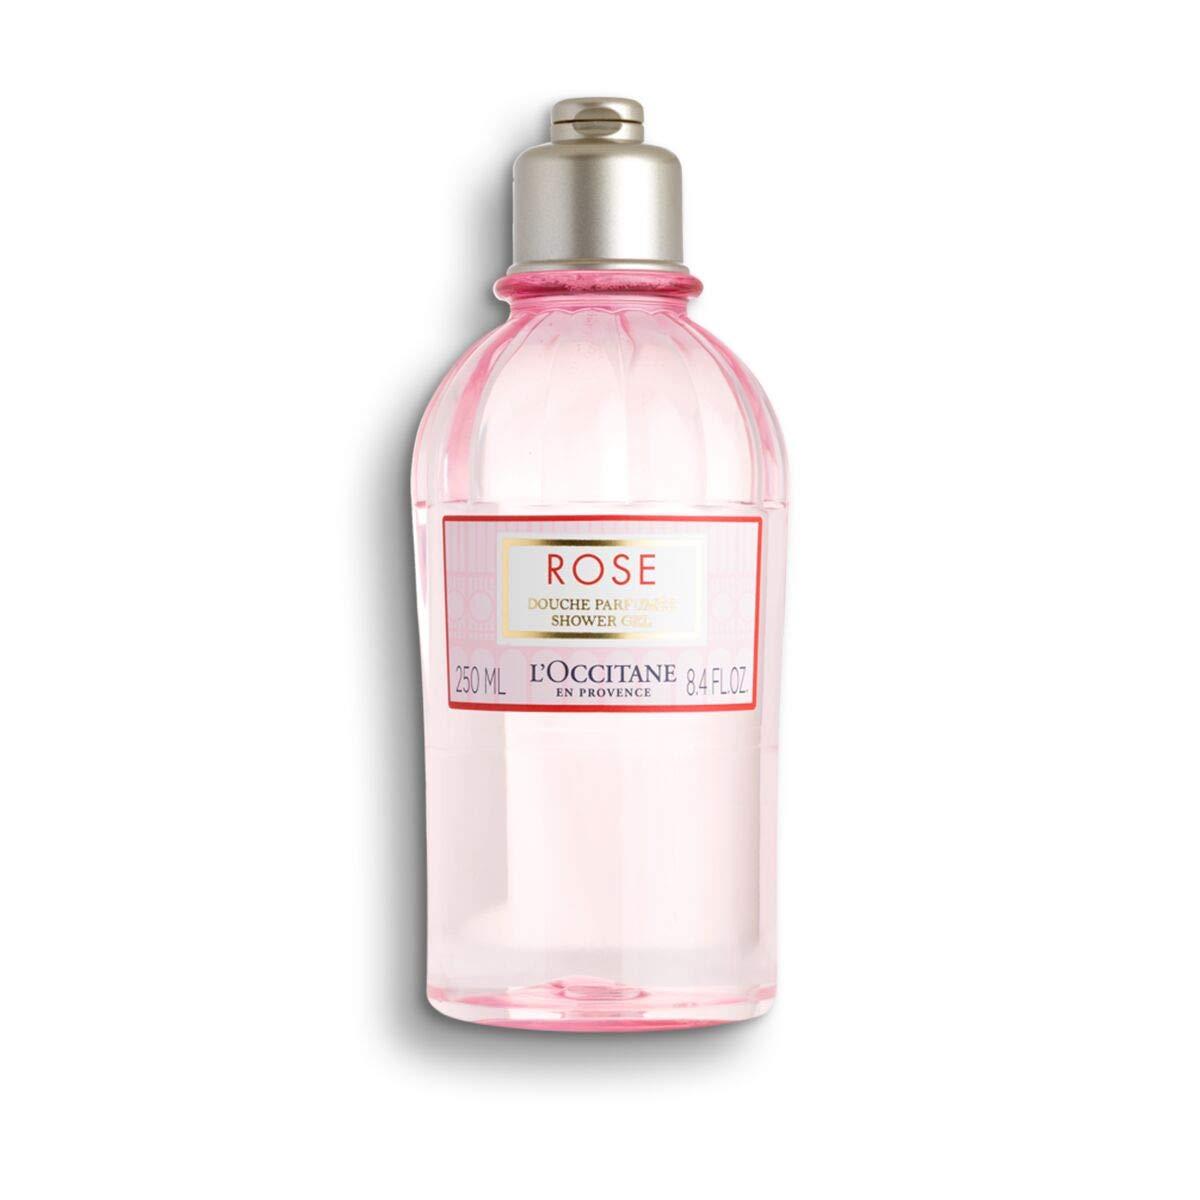 L'Occitane Gentle Rose Shower Gel Enriched with Rosa Centifolia Floral Water, 8.4Fl Oz